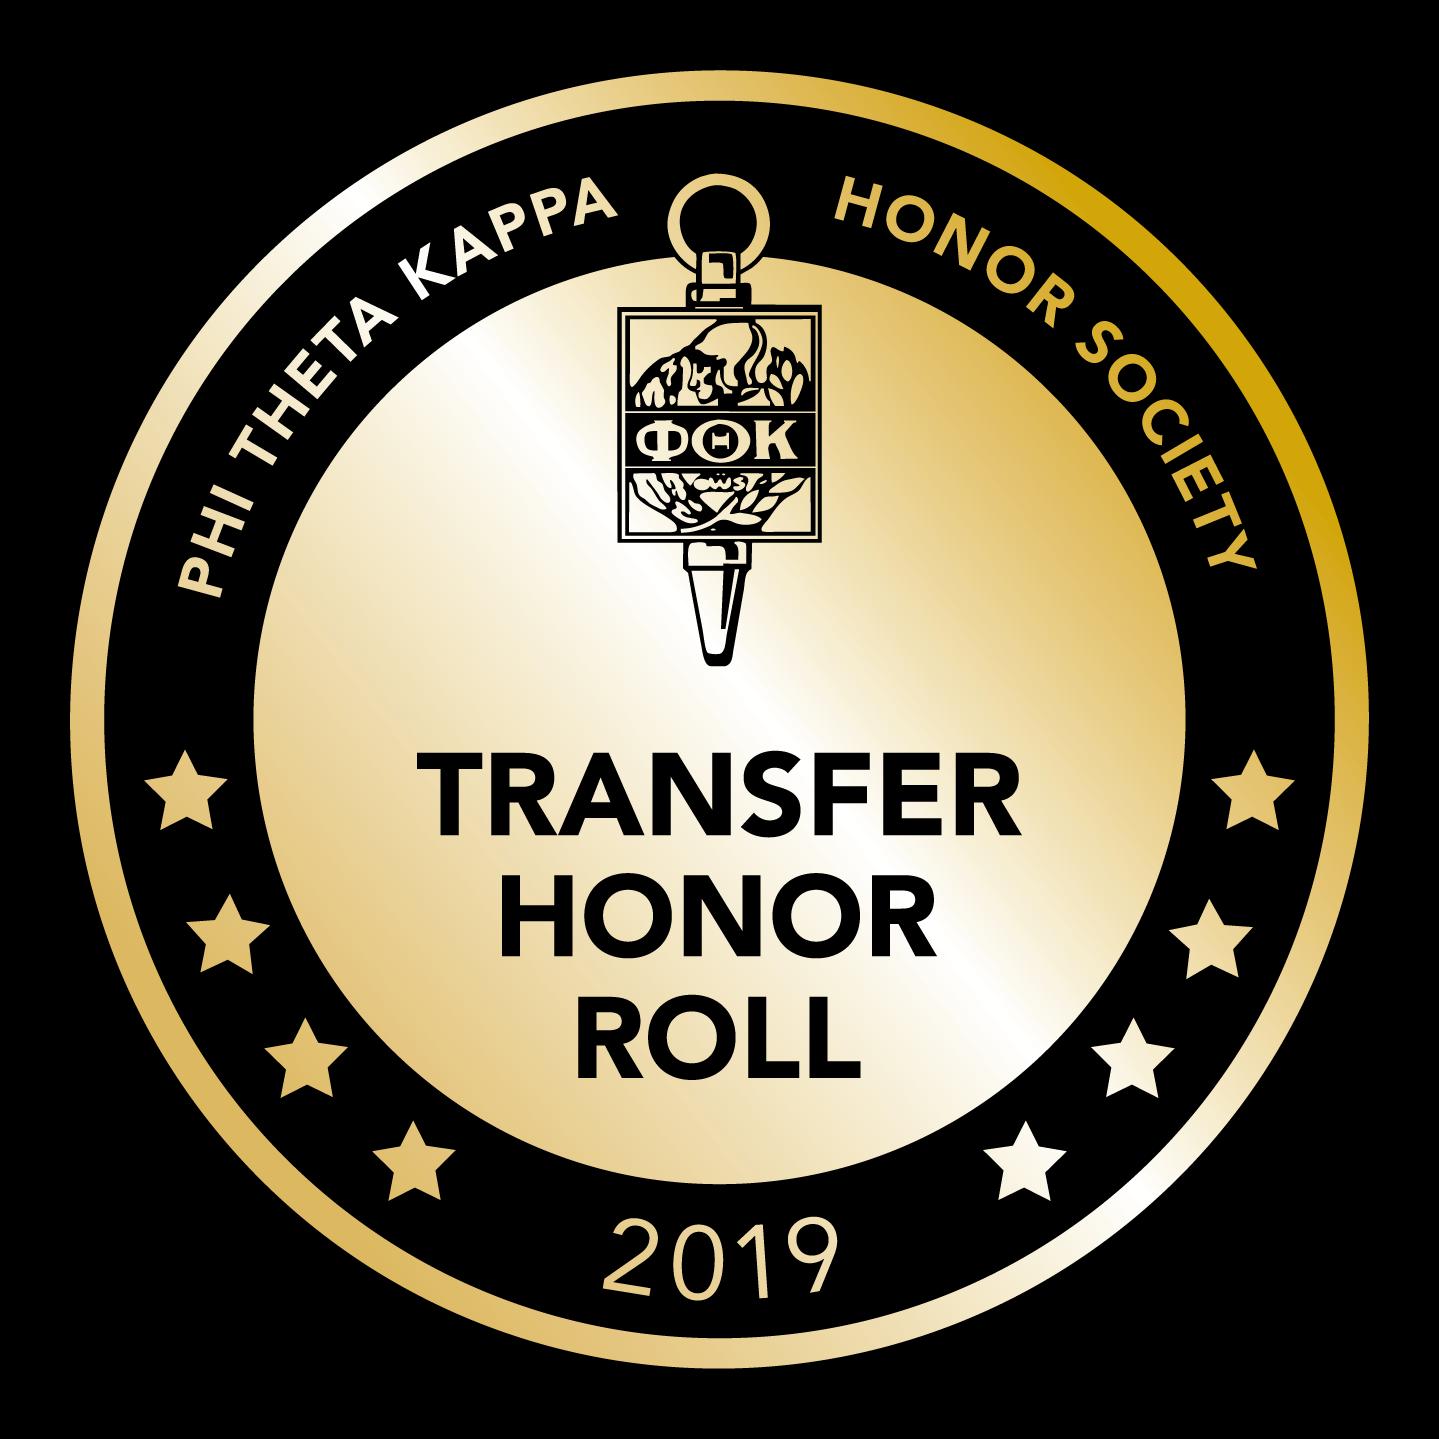 Phi Theta Kappa Transfer Honor Roll 2019